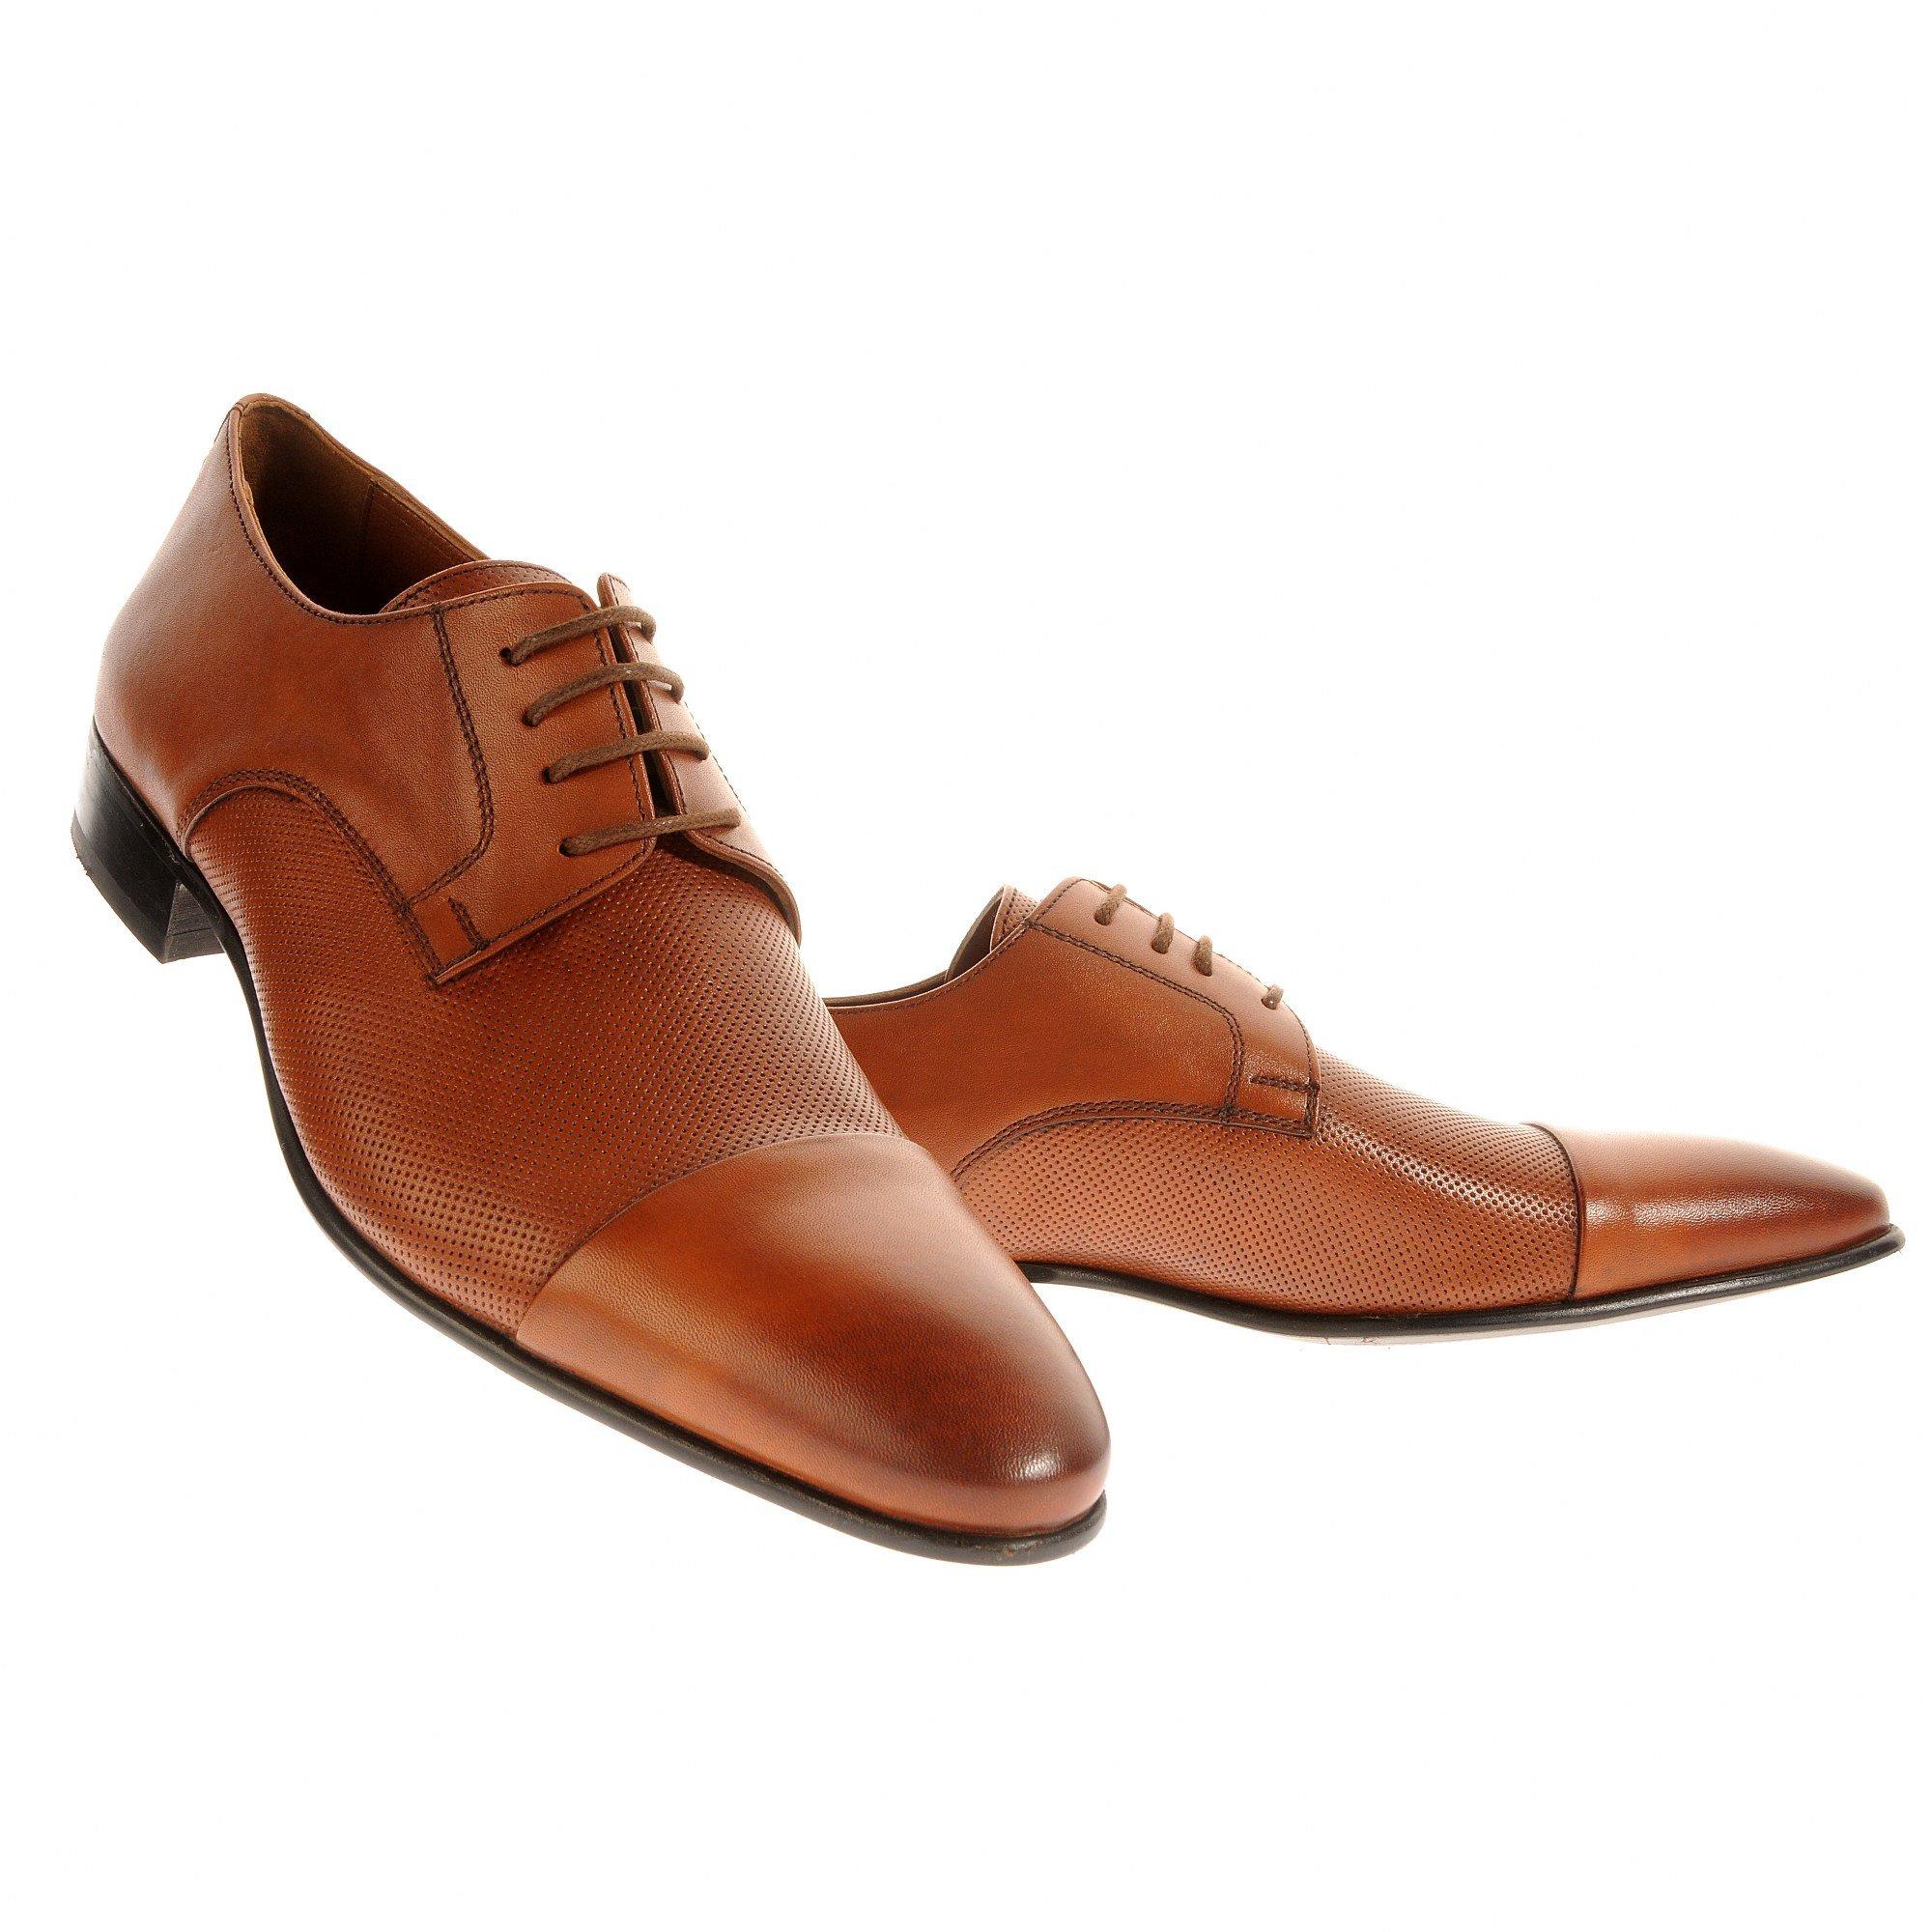 muske cipele #136 - prodaja muskih cipela, muske cipele beograd, muska odela